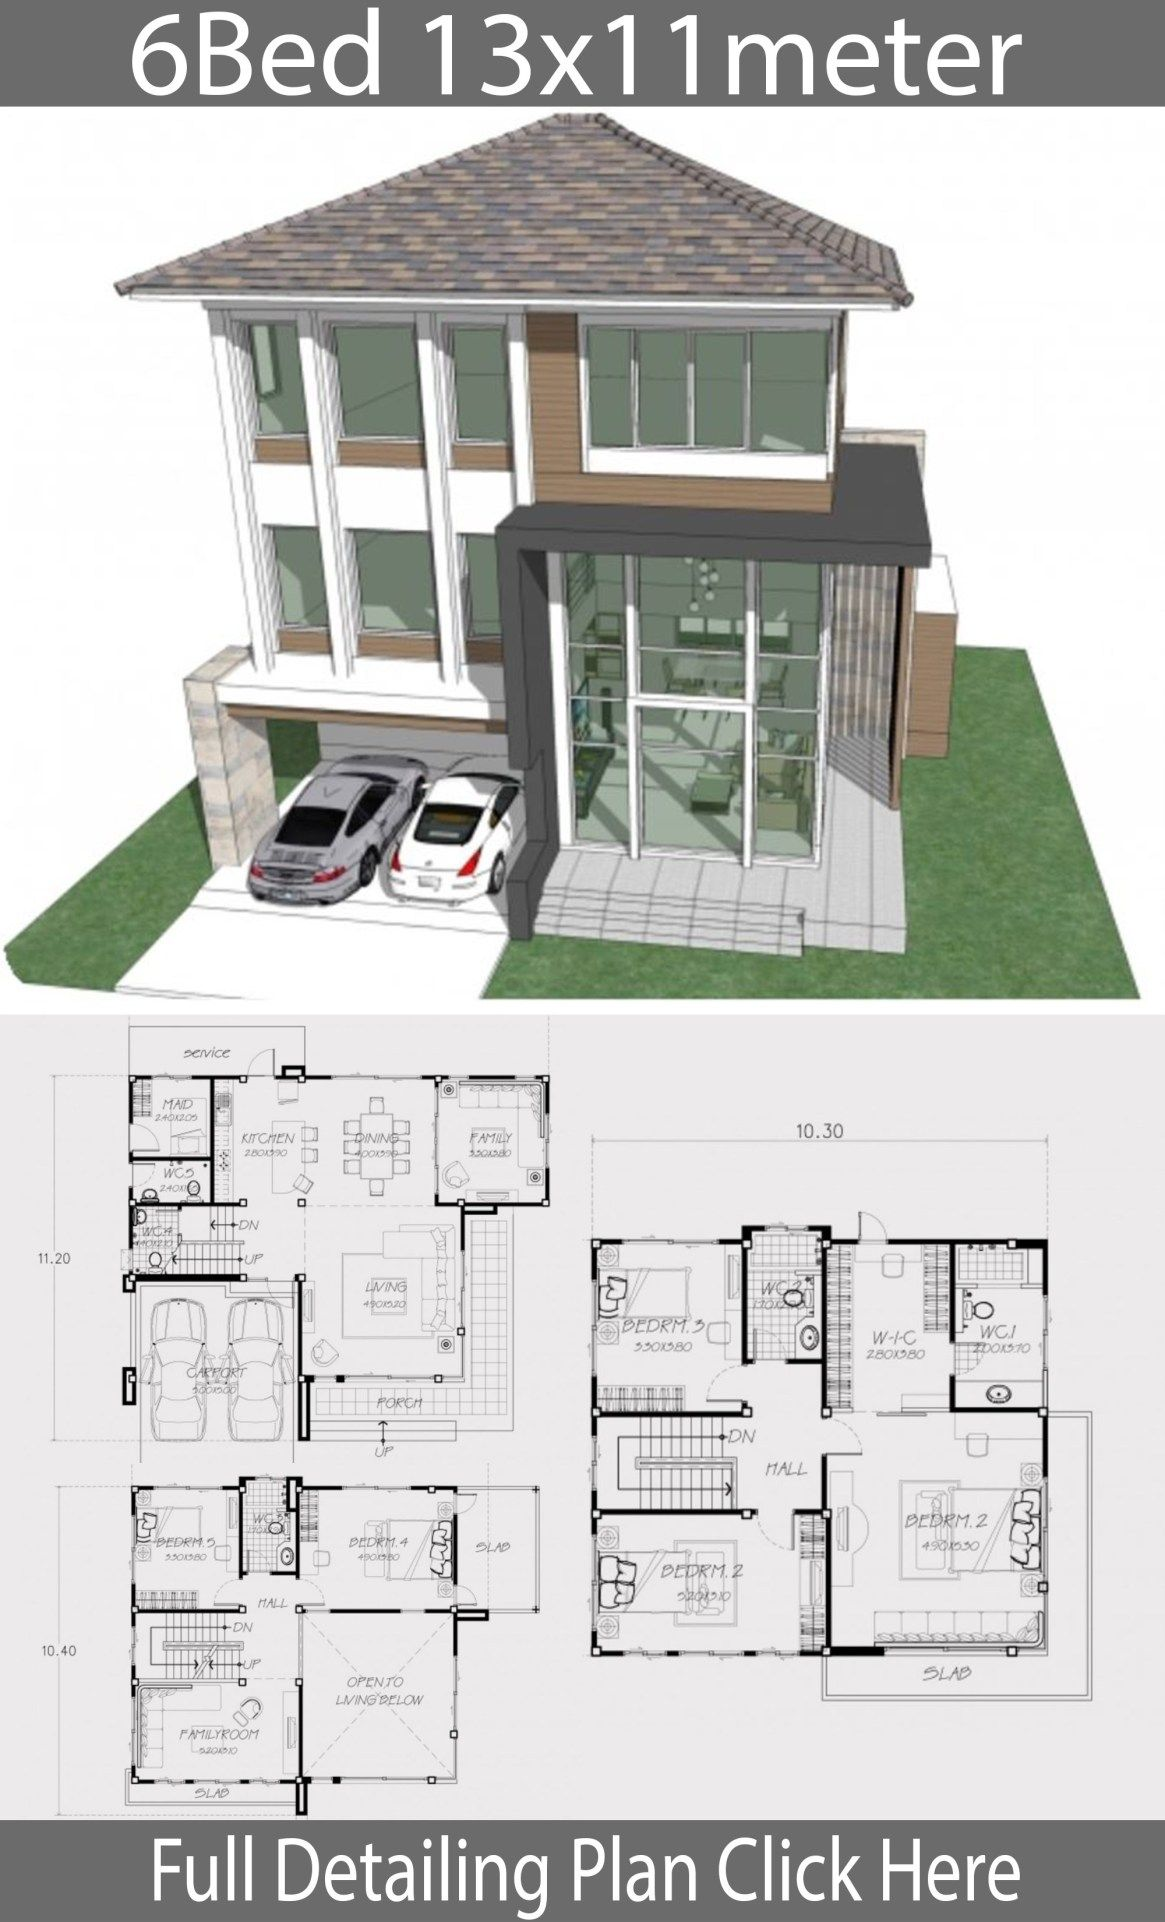 Home Design Plan 13x11m With 6 Bedrooms Home Design With Plansearch Home Design Plan House Design Master Bedroom Plans